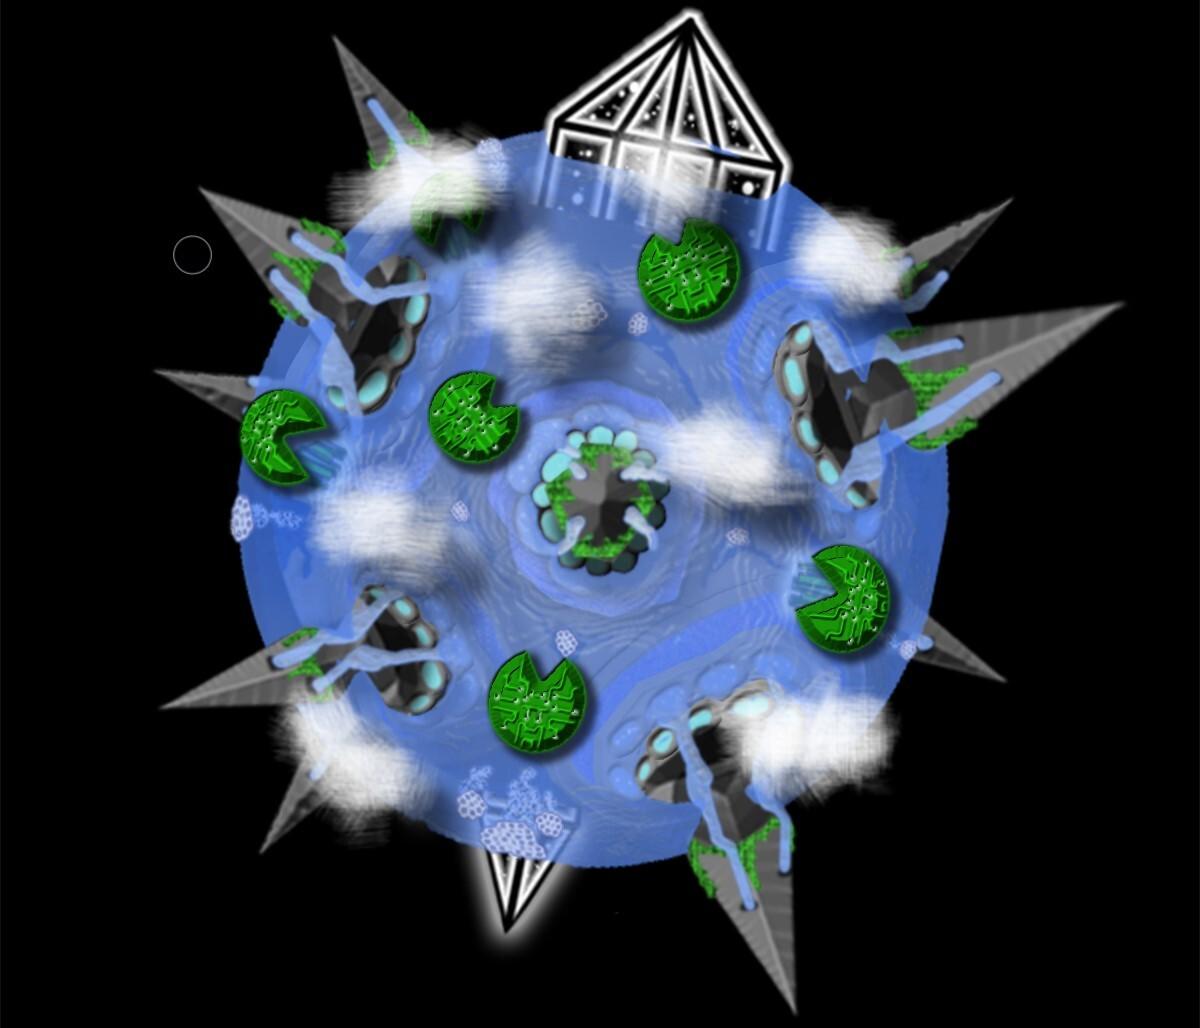 Jagg's Proto Planetary Phase